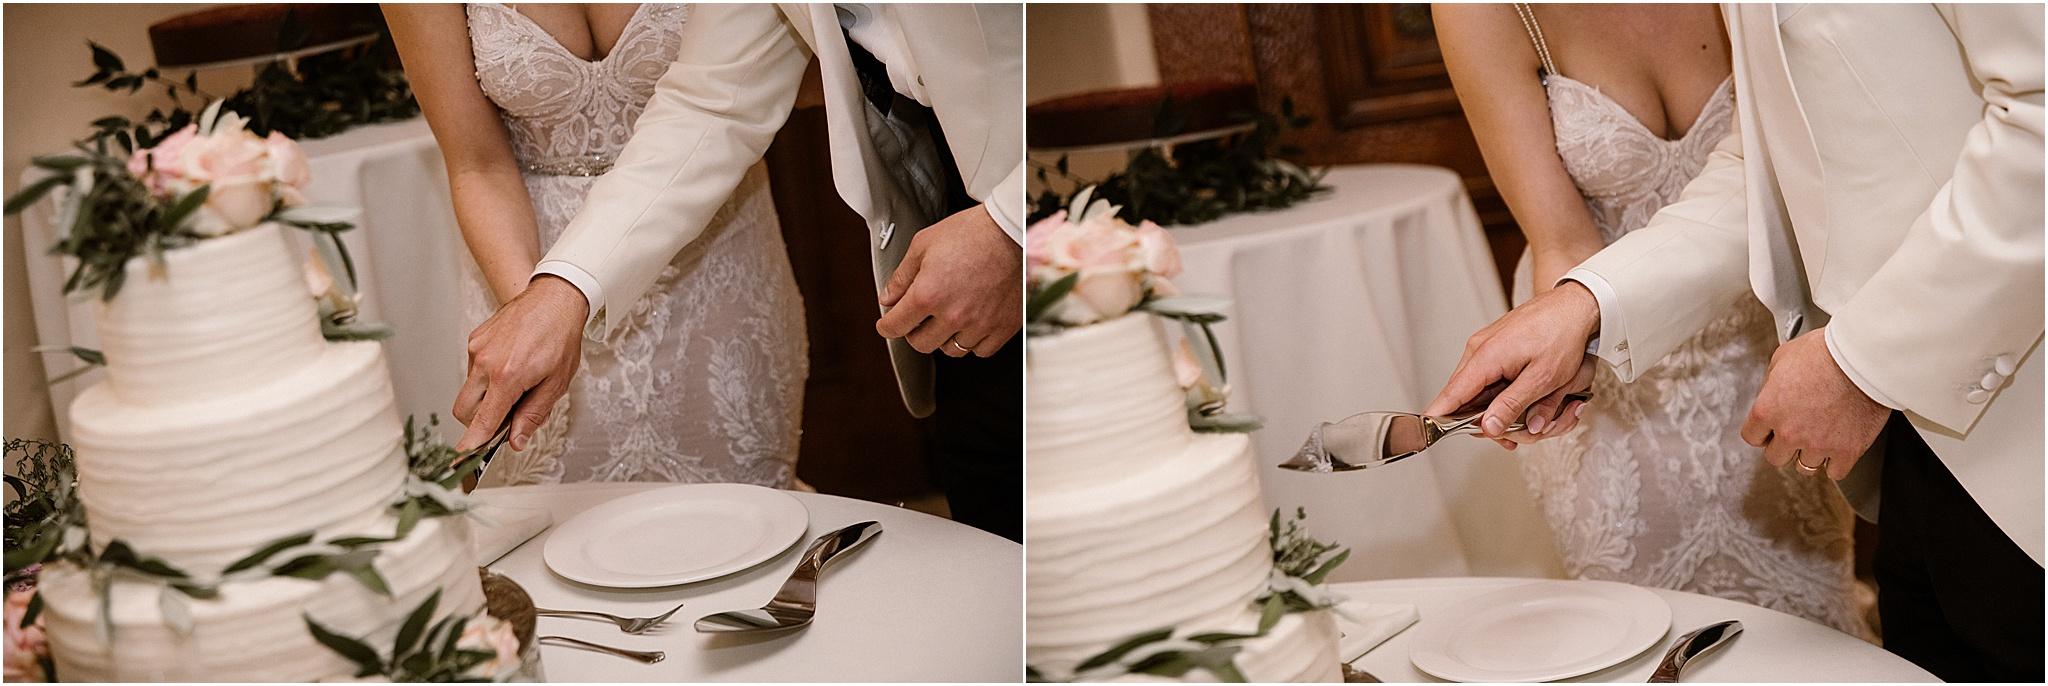 BLUE ROSE PHOTOGRAPHY SANTA FE WEDDING_59